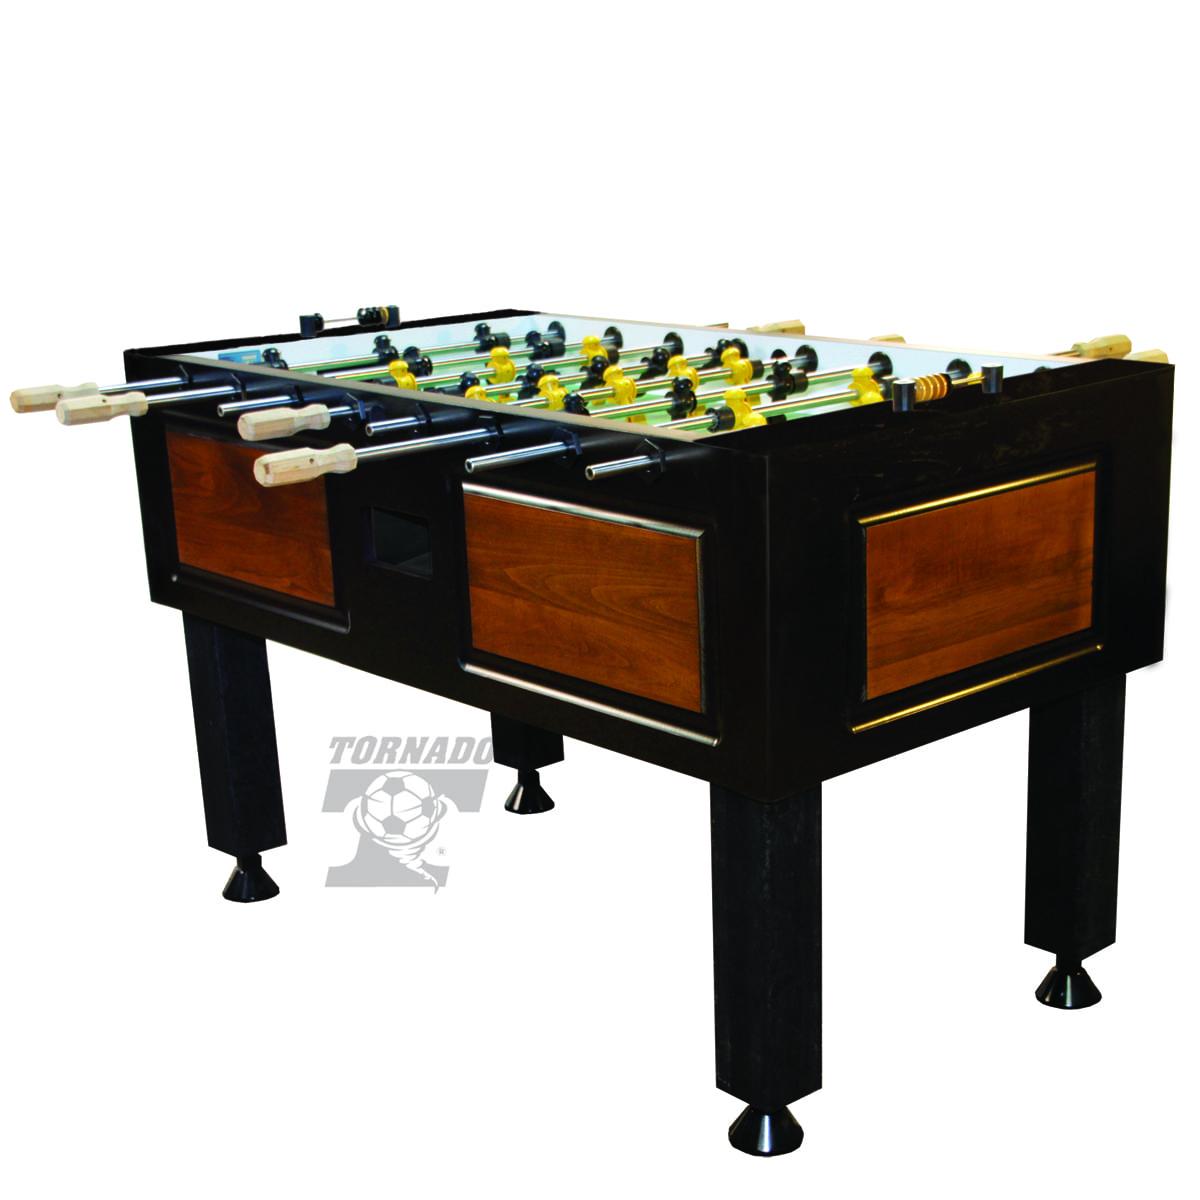 Tornado worthington foosball table - Used tornado foosball table ...